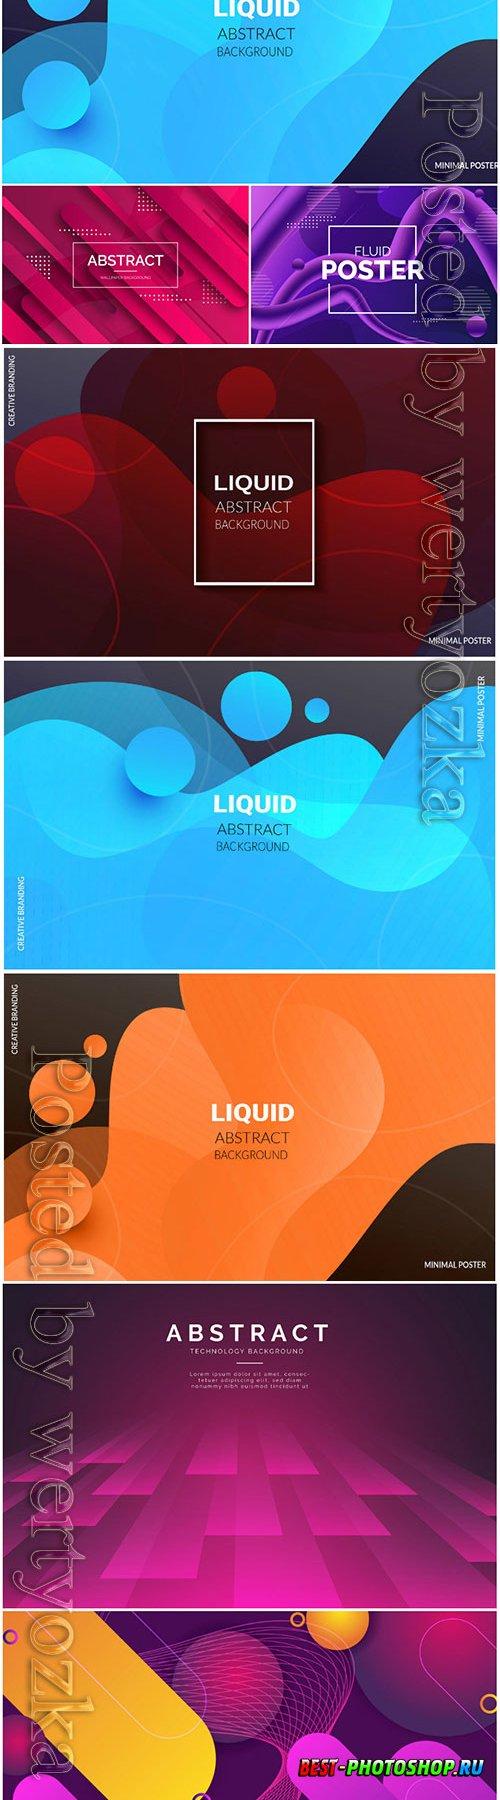 Liquid vector abstract background